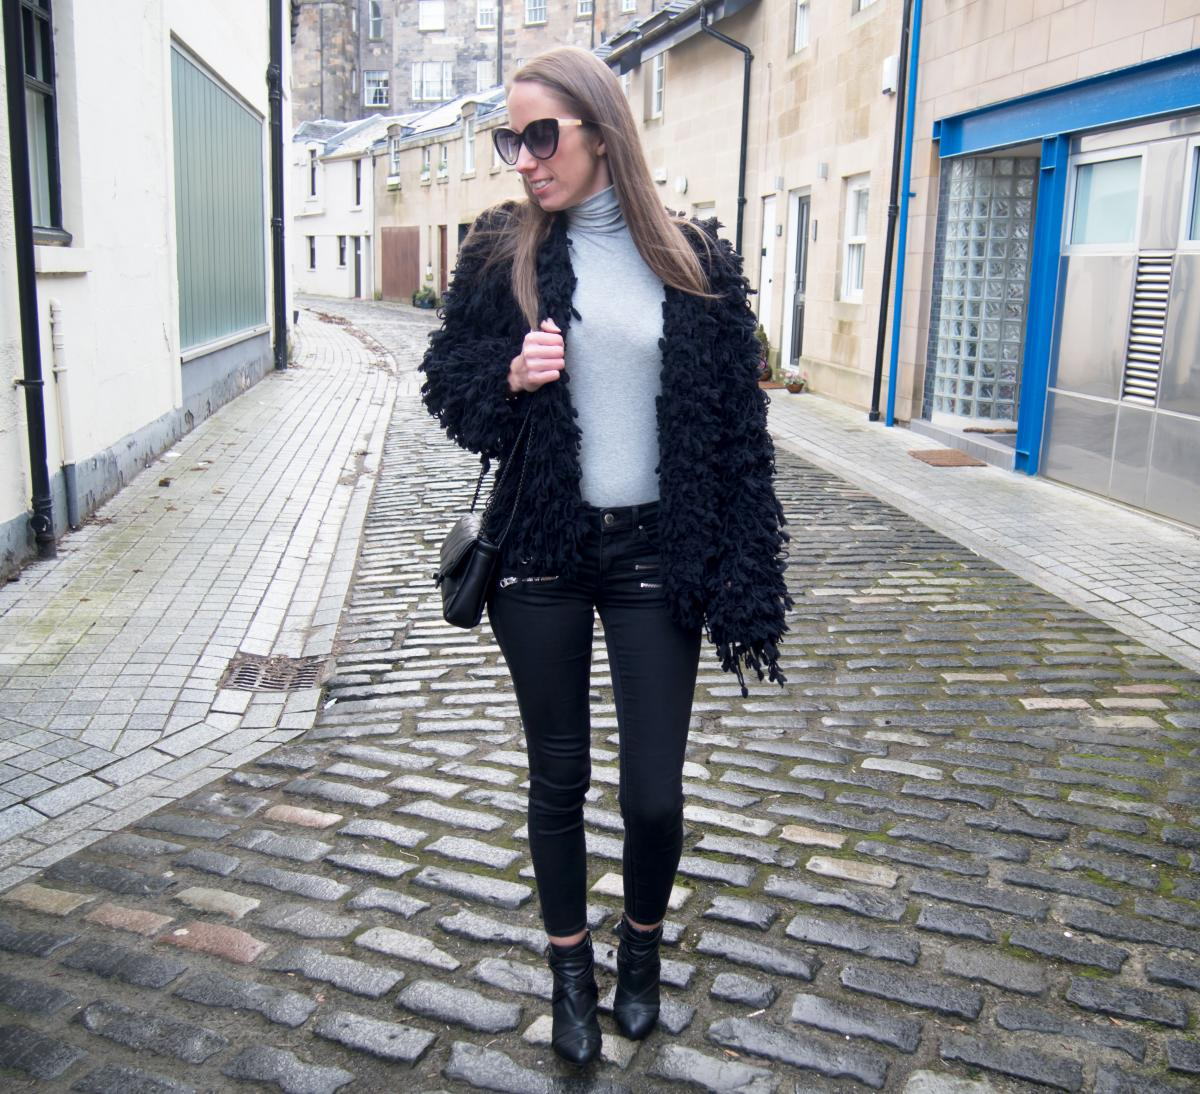 Zara-Black-Cosy-Jacket---ASOS-Bodysuit-10